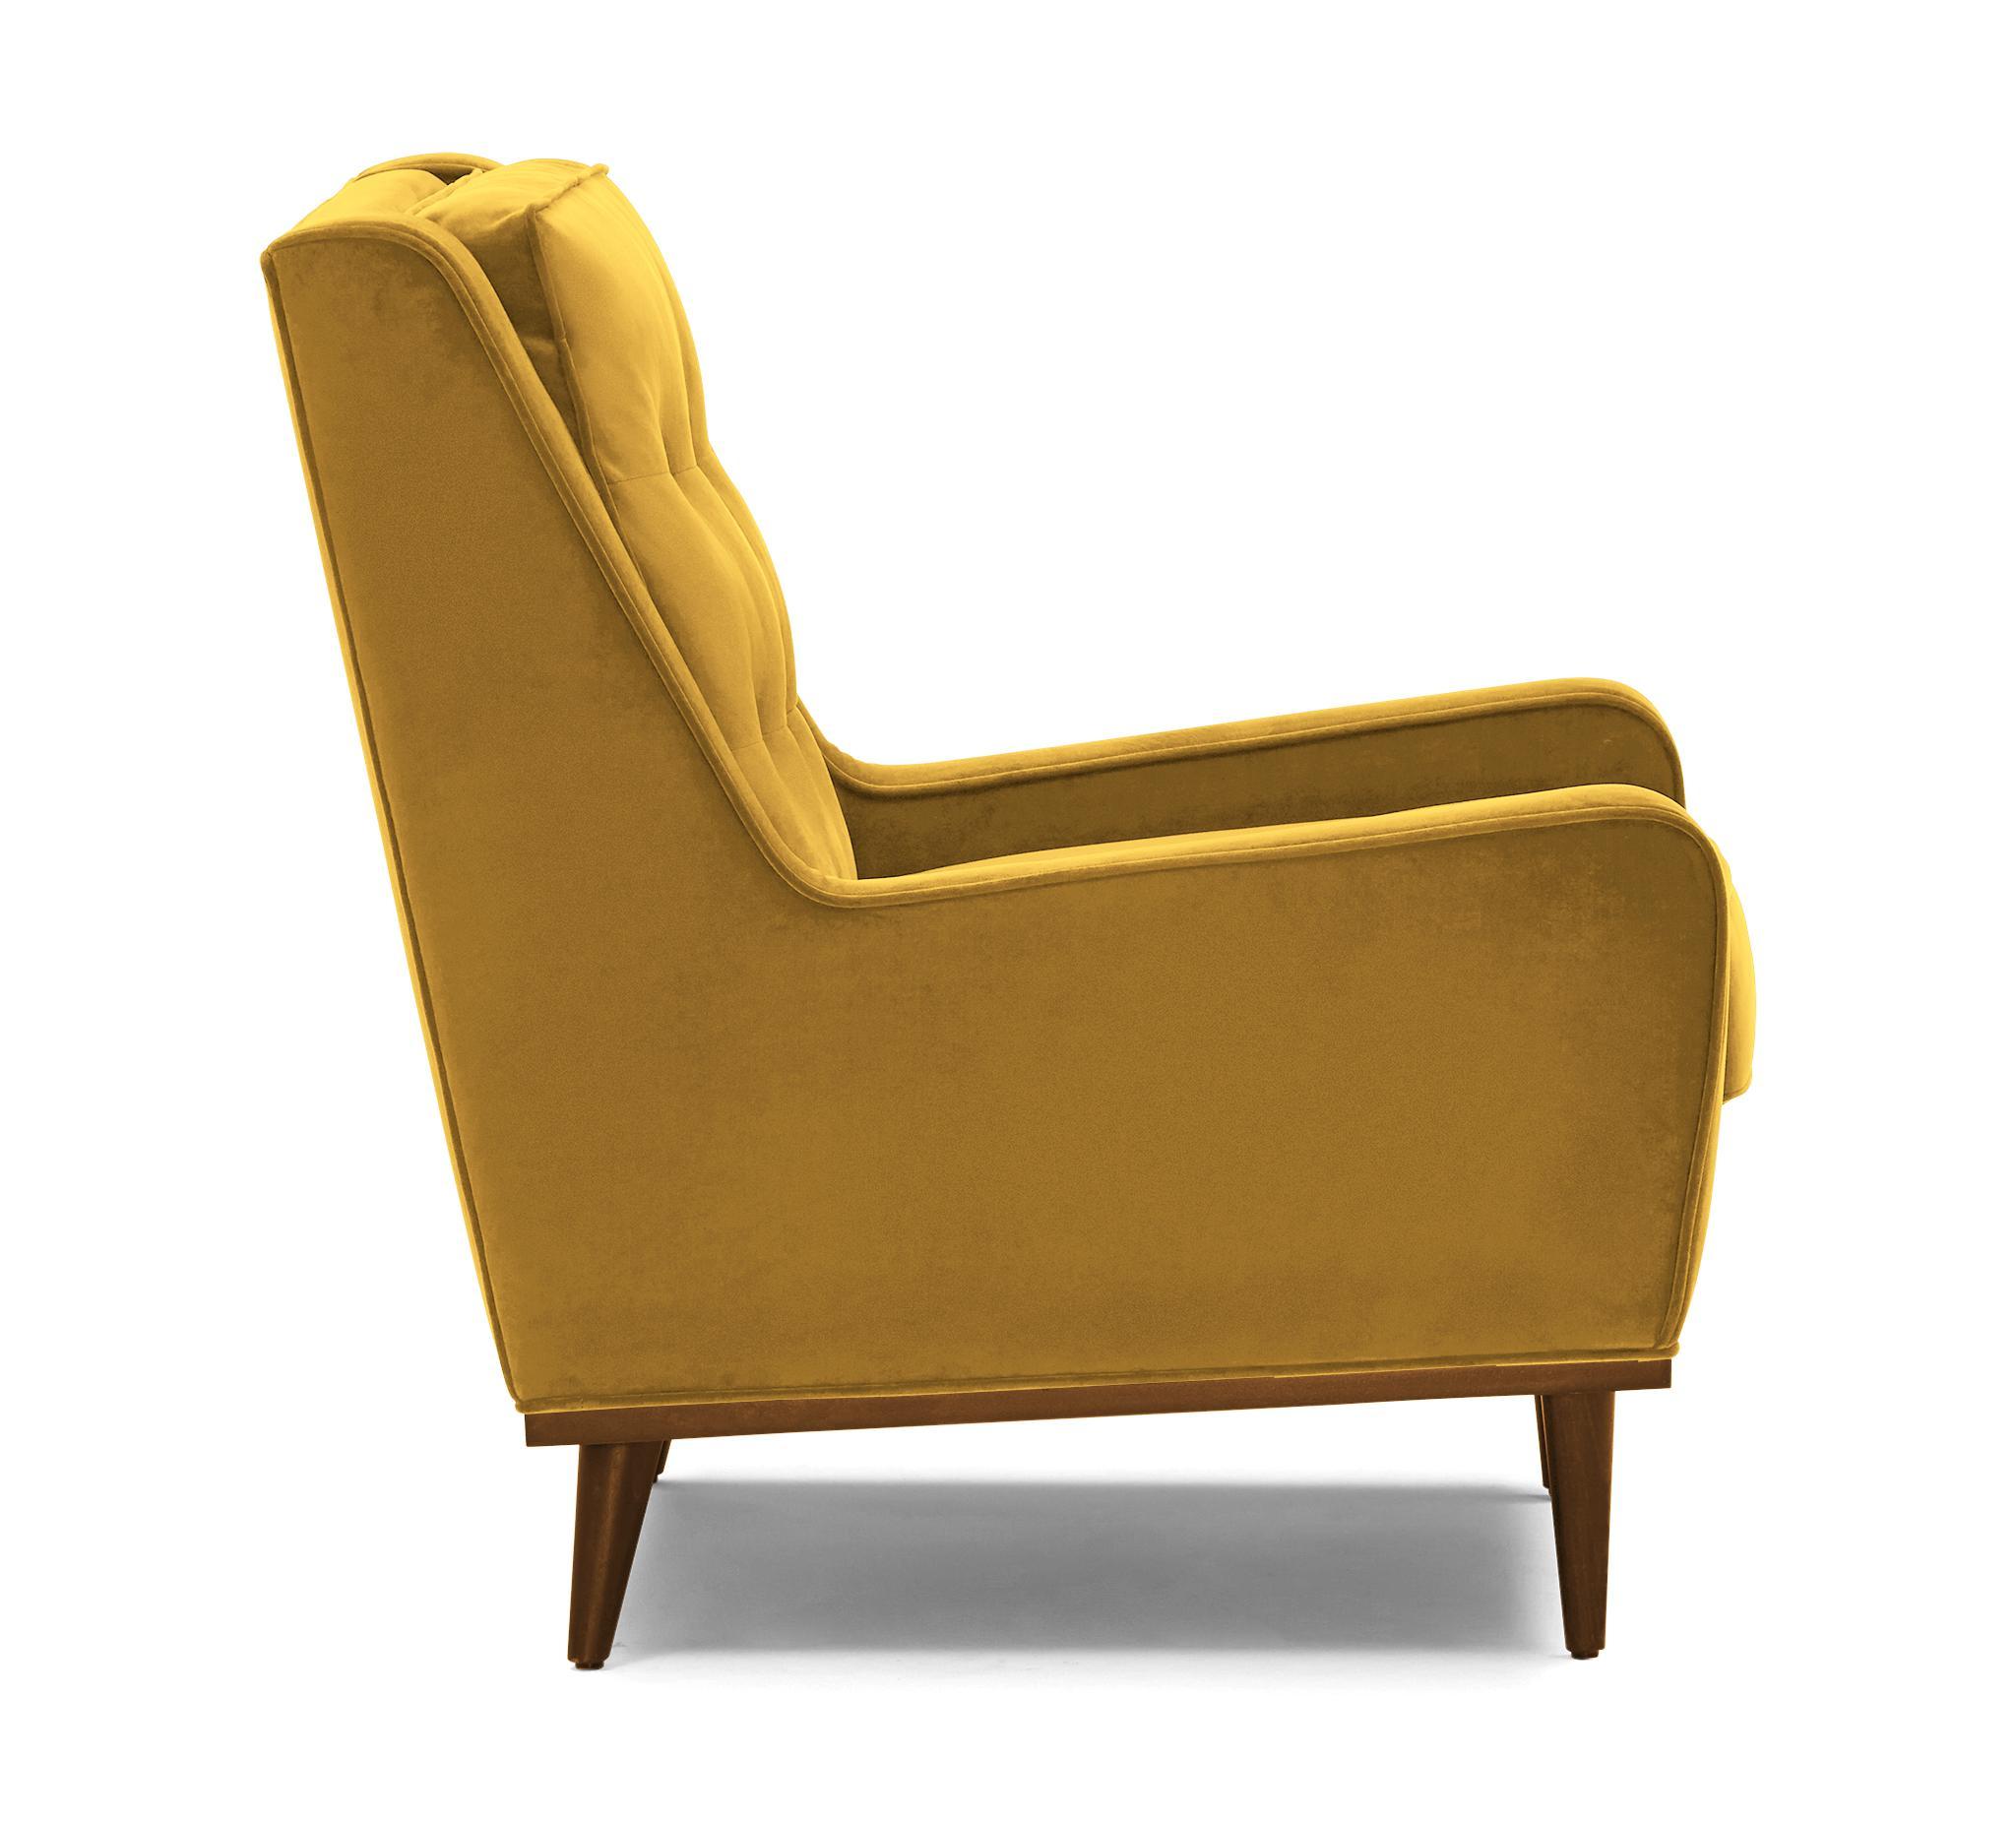 Yellow Brice Mid Century Modern Chair - Bentley Daisey - Mocha